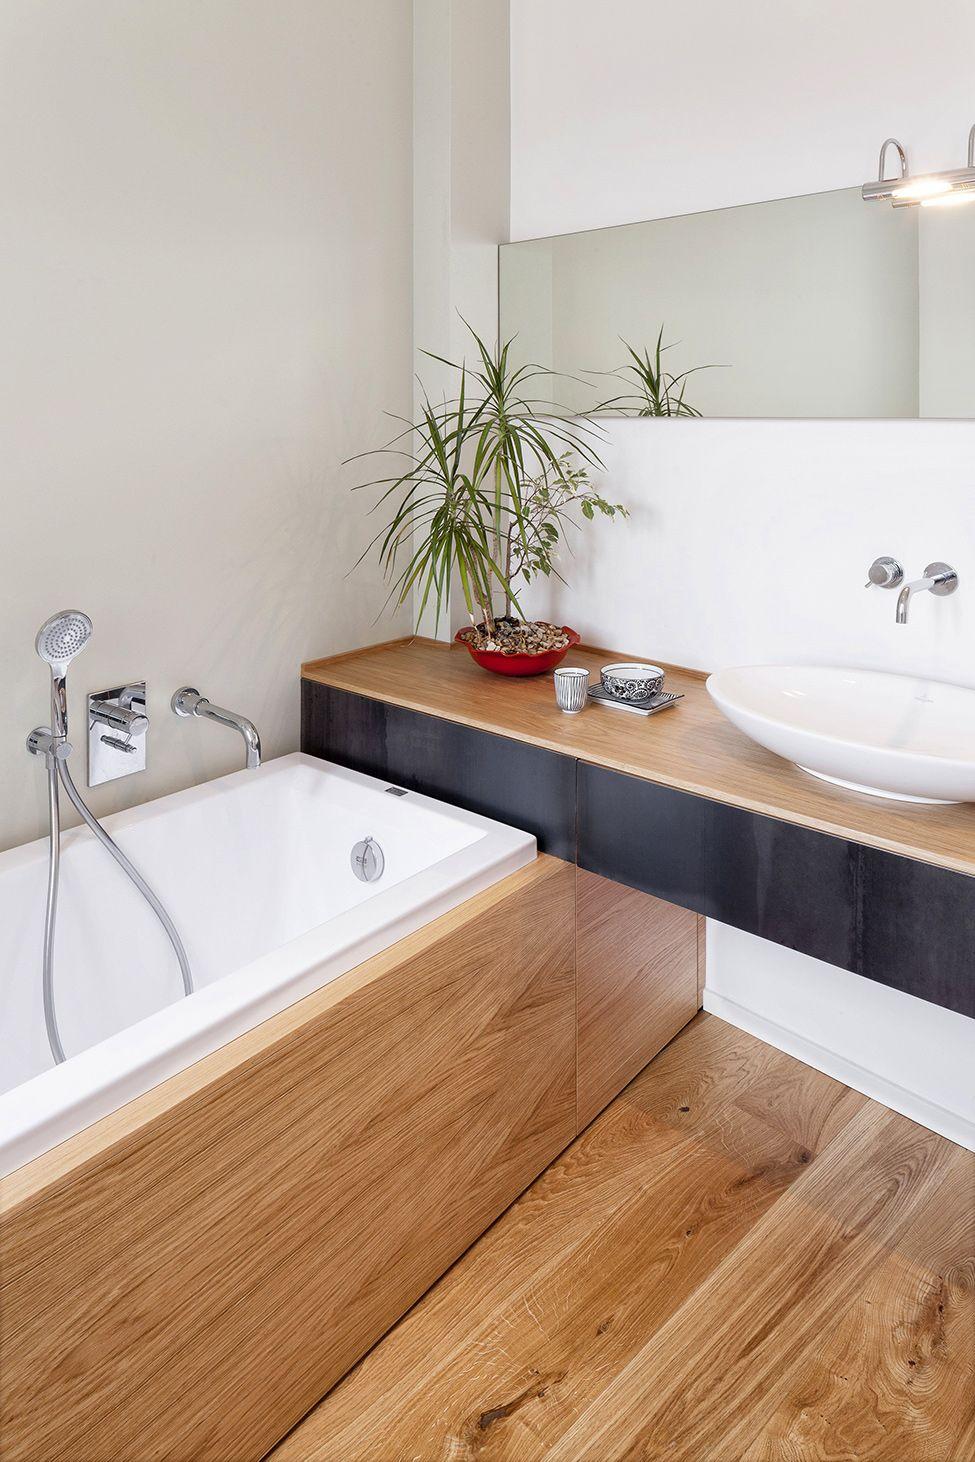 47 best ideas about Bathroom on Pinterest   Toilets  Modern small bathrooms  and Tile. 47 best ideas about Bathroom on Pinterest   Toilets  Modern small